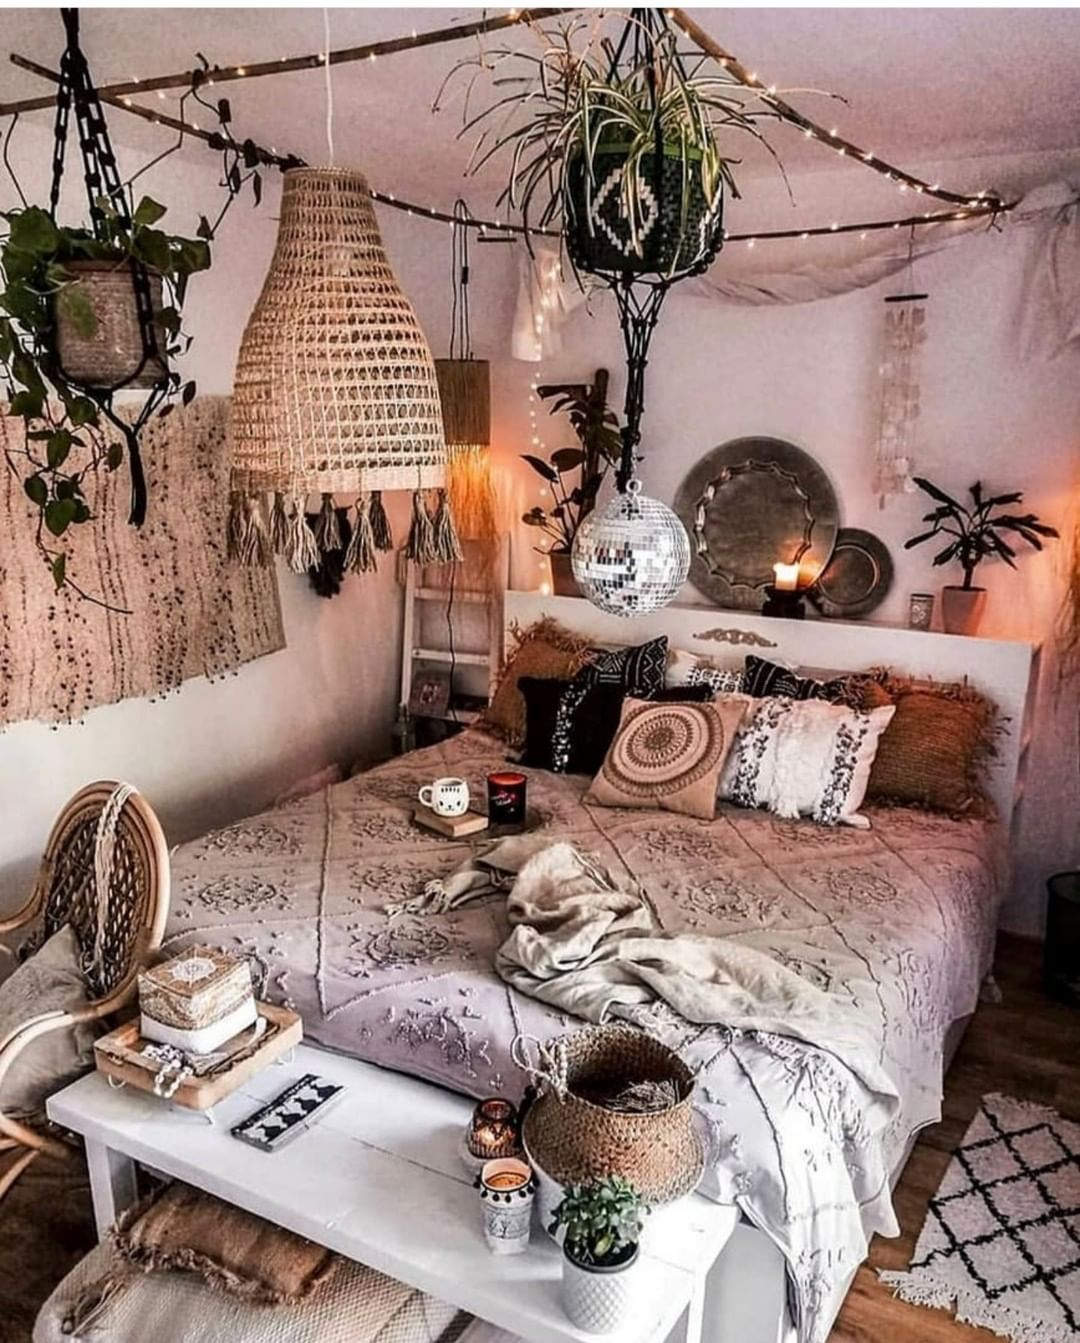 60 Bedrooms with Boho Colors Charm (mit Bildern